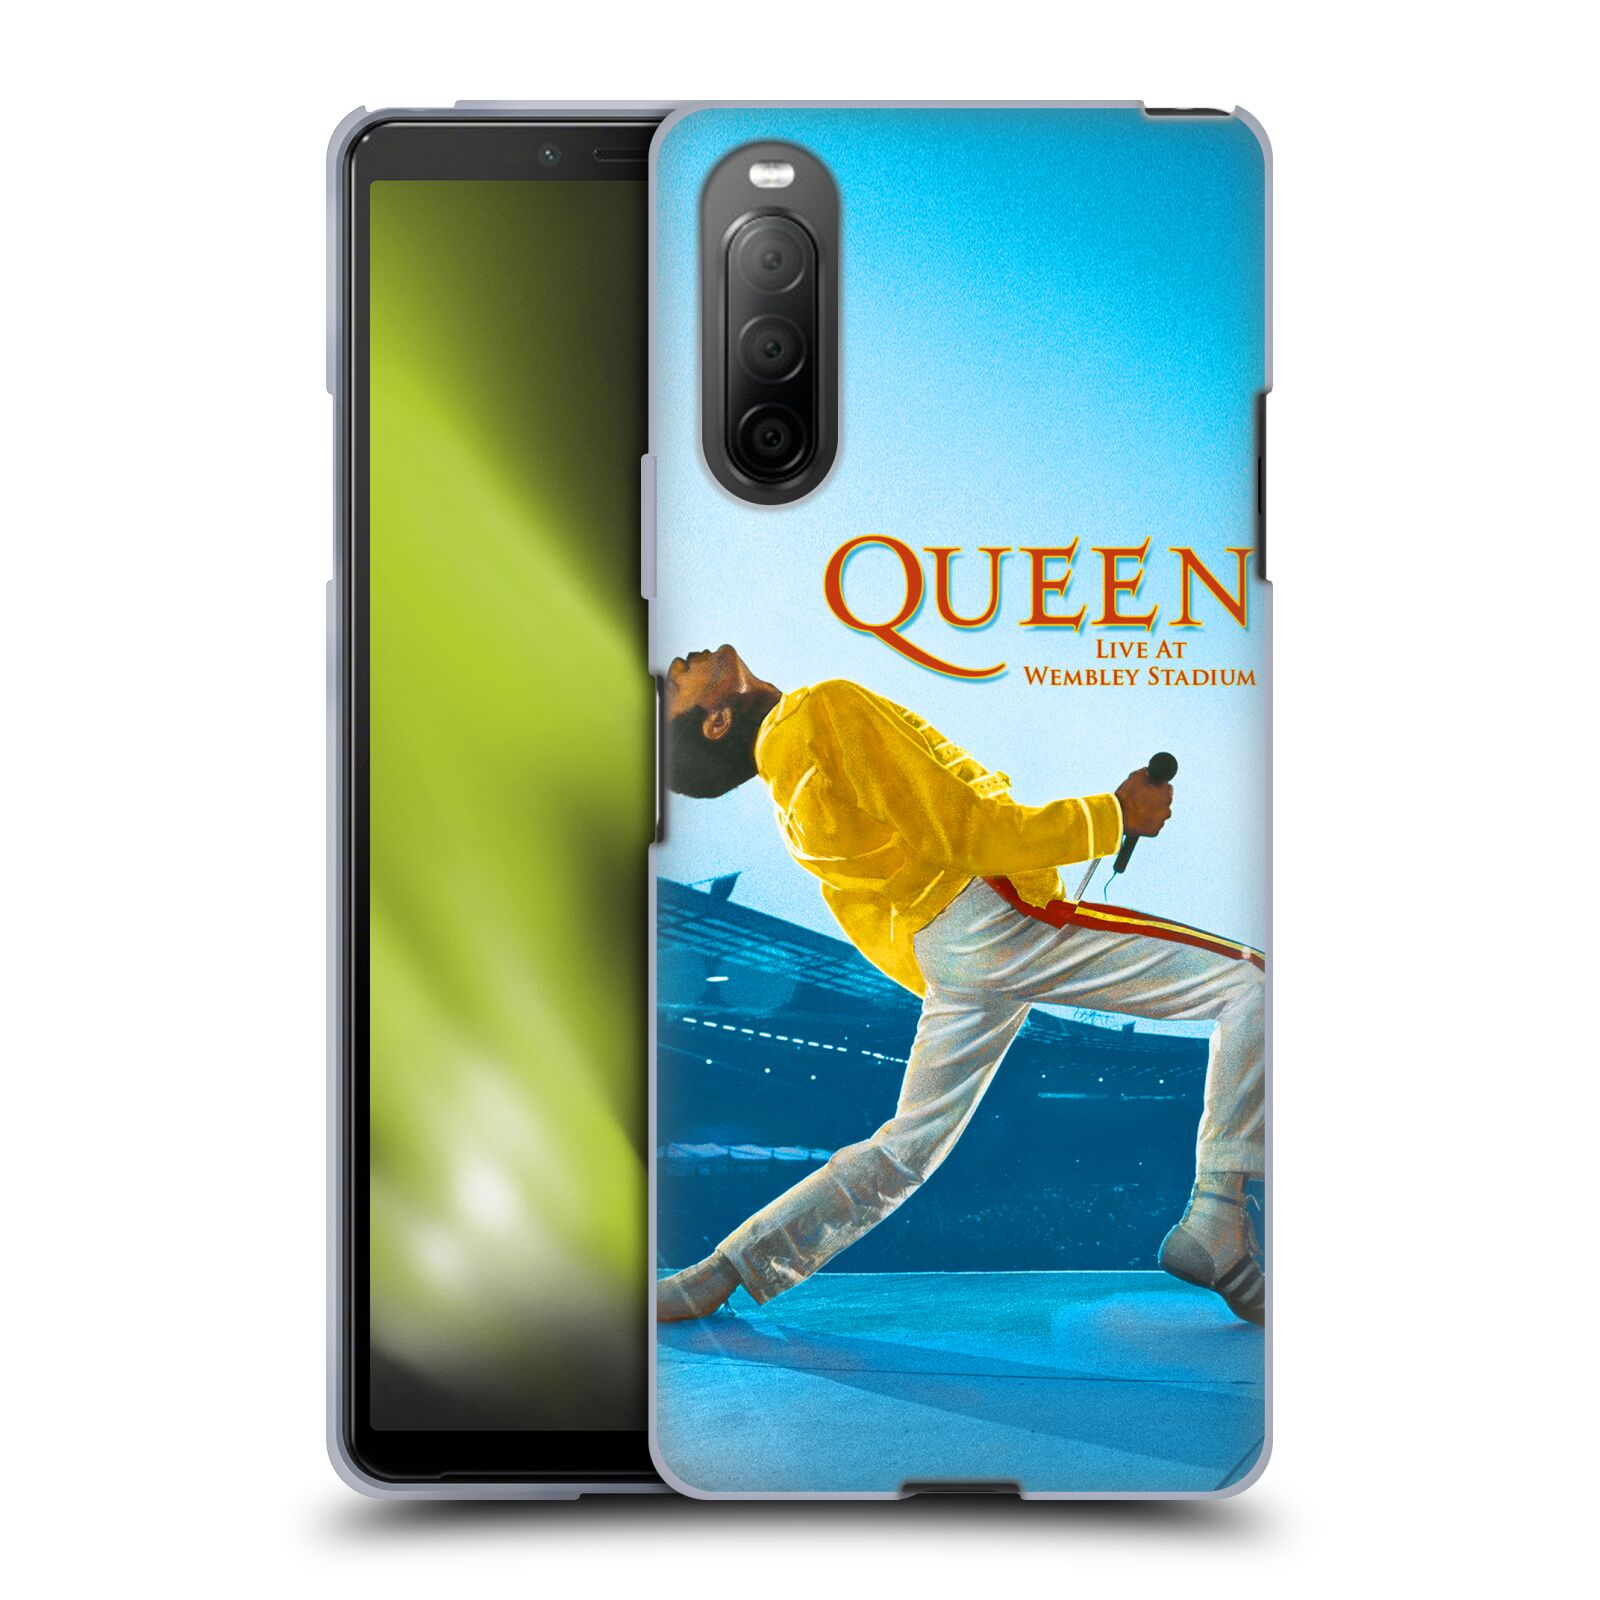 Silikonové pouzdro na mobil Sony Xperia 10 II - Head Case - Queen - Freddie Mercury